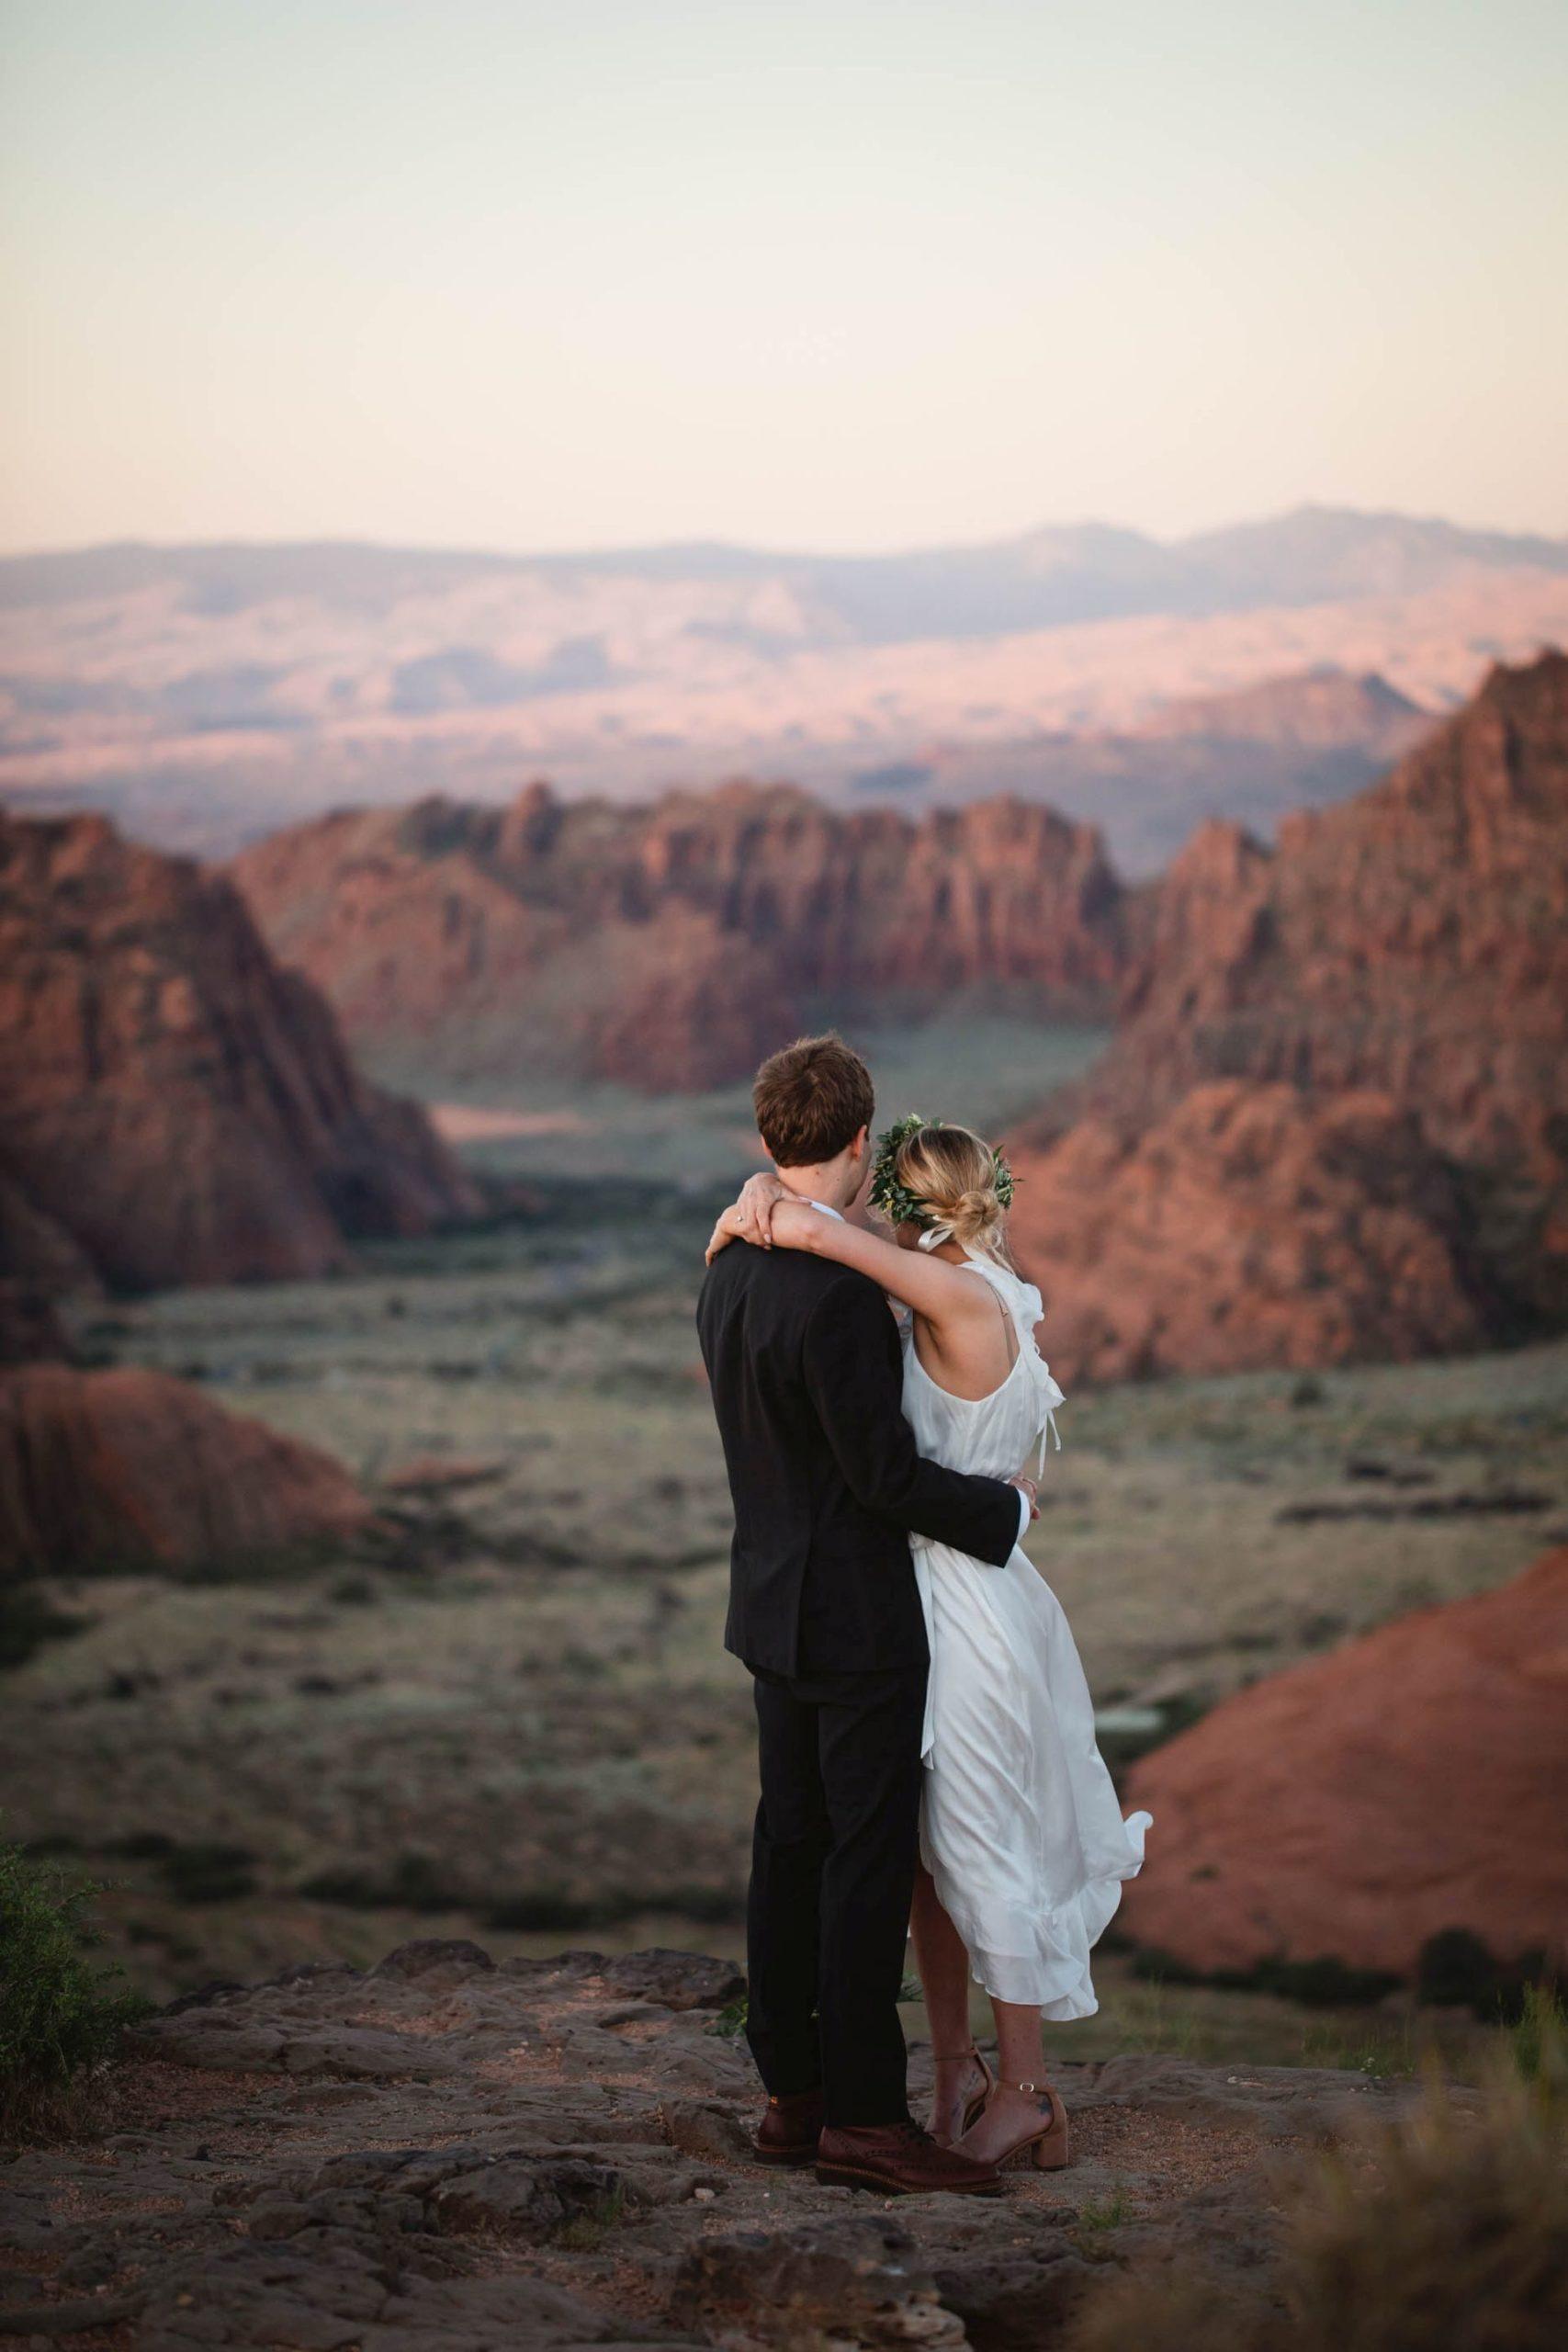 hike-out wedding utah desert - couple in front of desert views at sunset